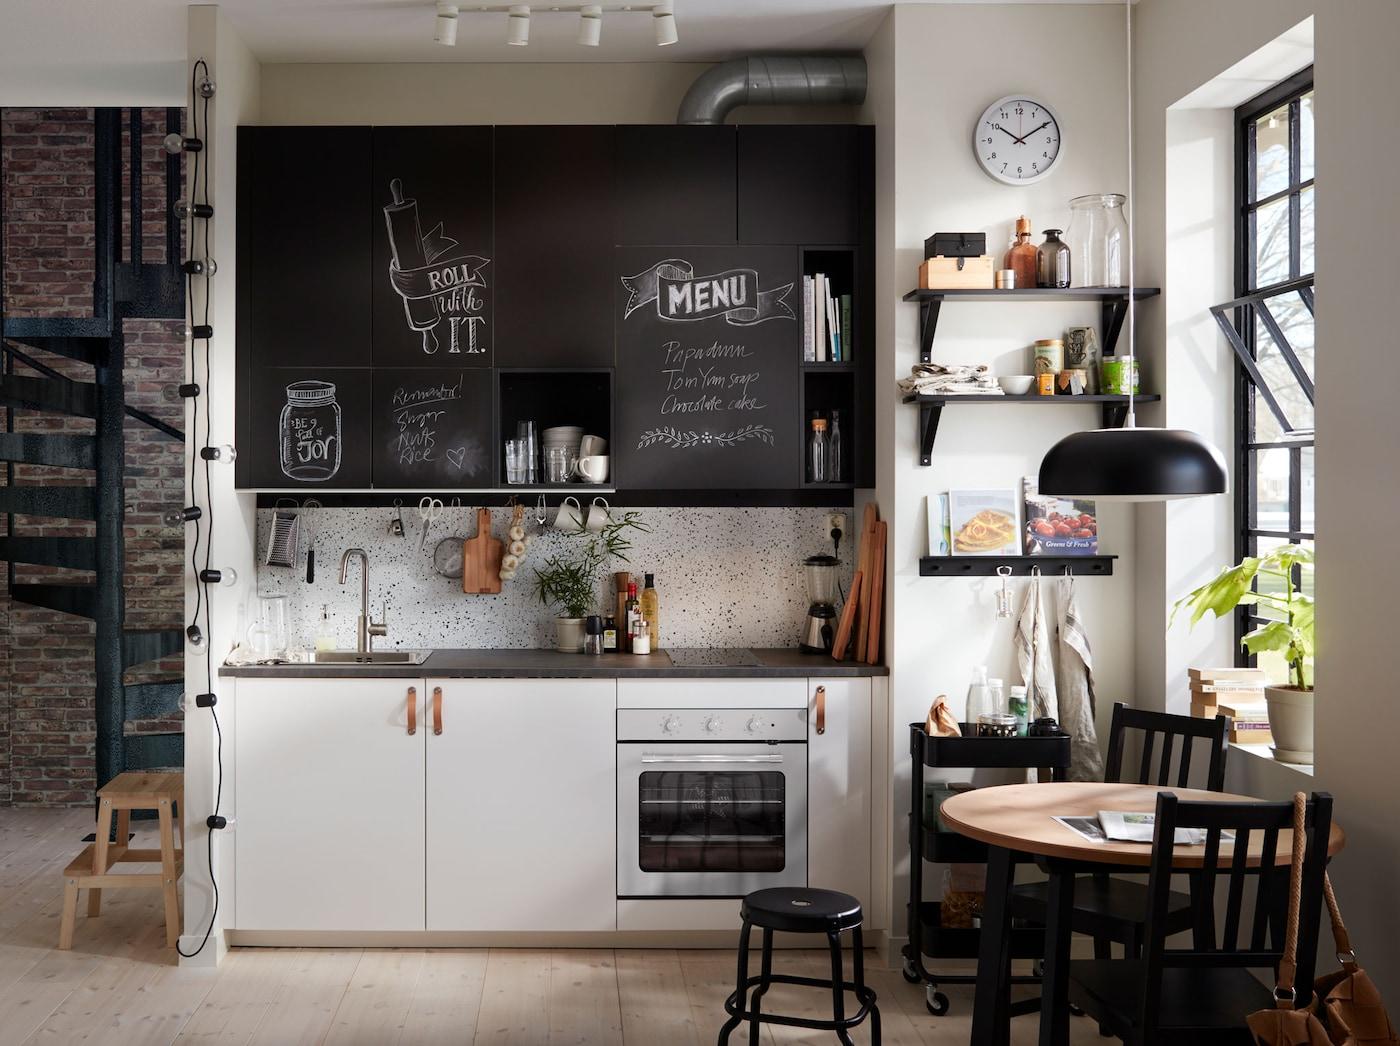 Trolley Keuken Ikea : Keuken stijlen ikea